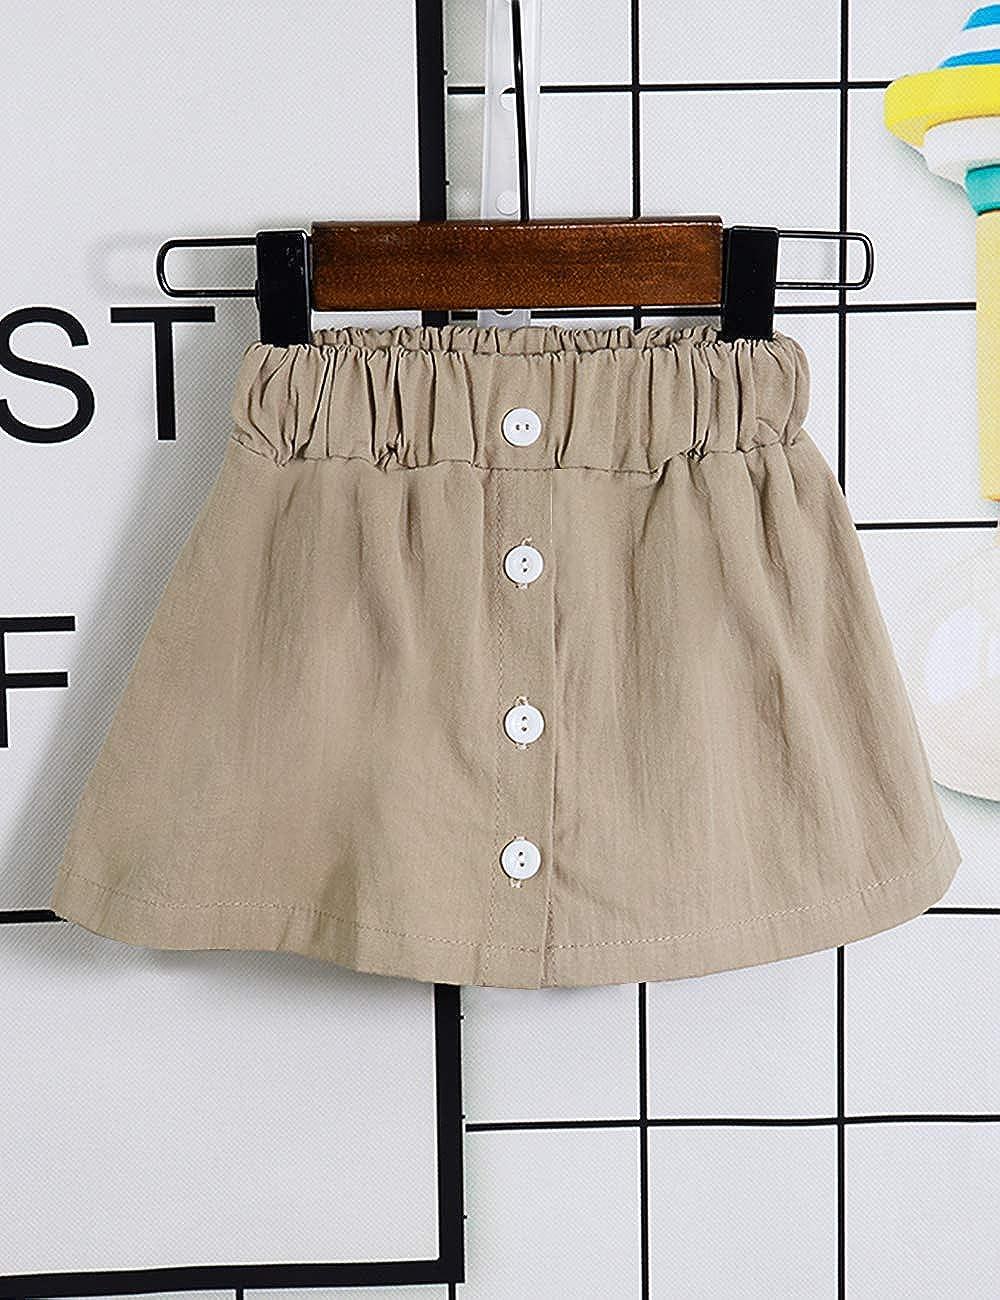 Toddler Baby Girl Outfits 2Pcs Ruffle Print T-Shirt Tops and Shorts Pants Clothes Sets 4T Brown